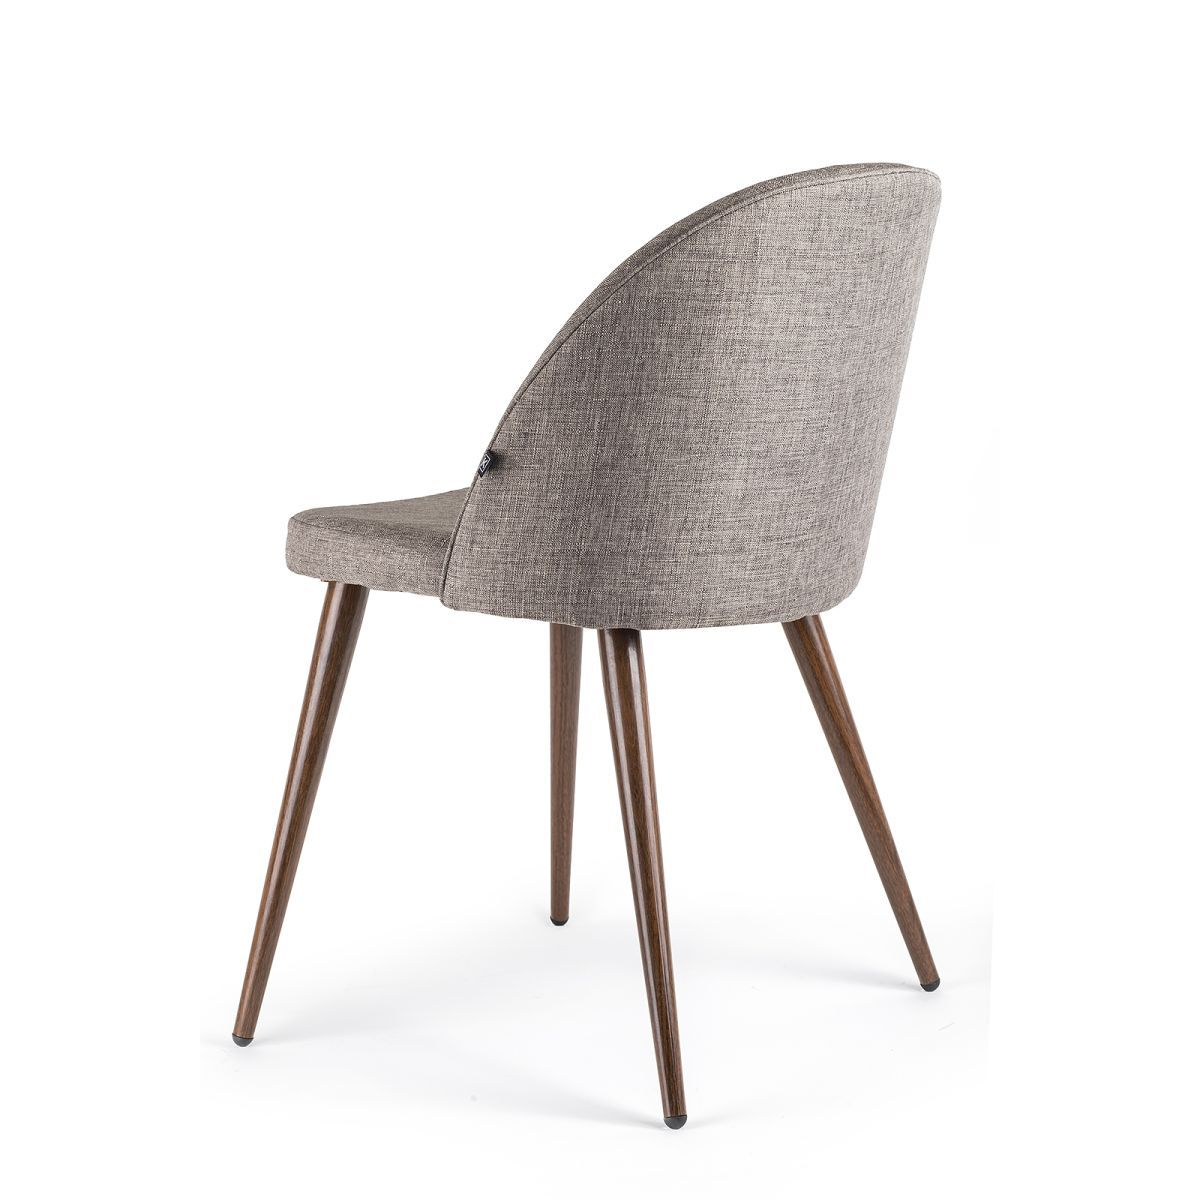 Stuhl Skandinavisch homekraft miku stühle skandinavisch esszimmerstühle esszimmerstühle